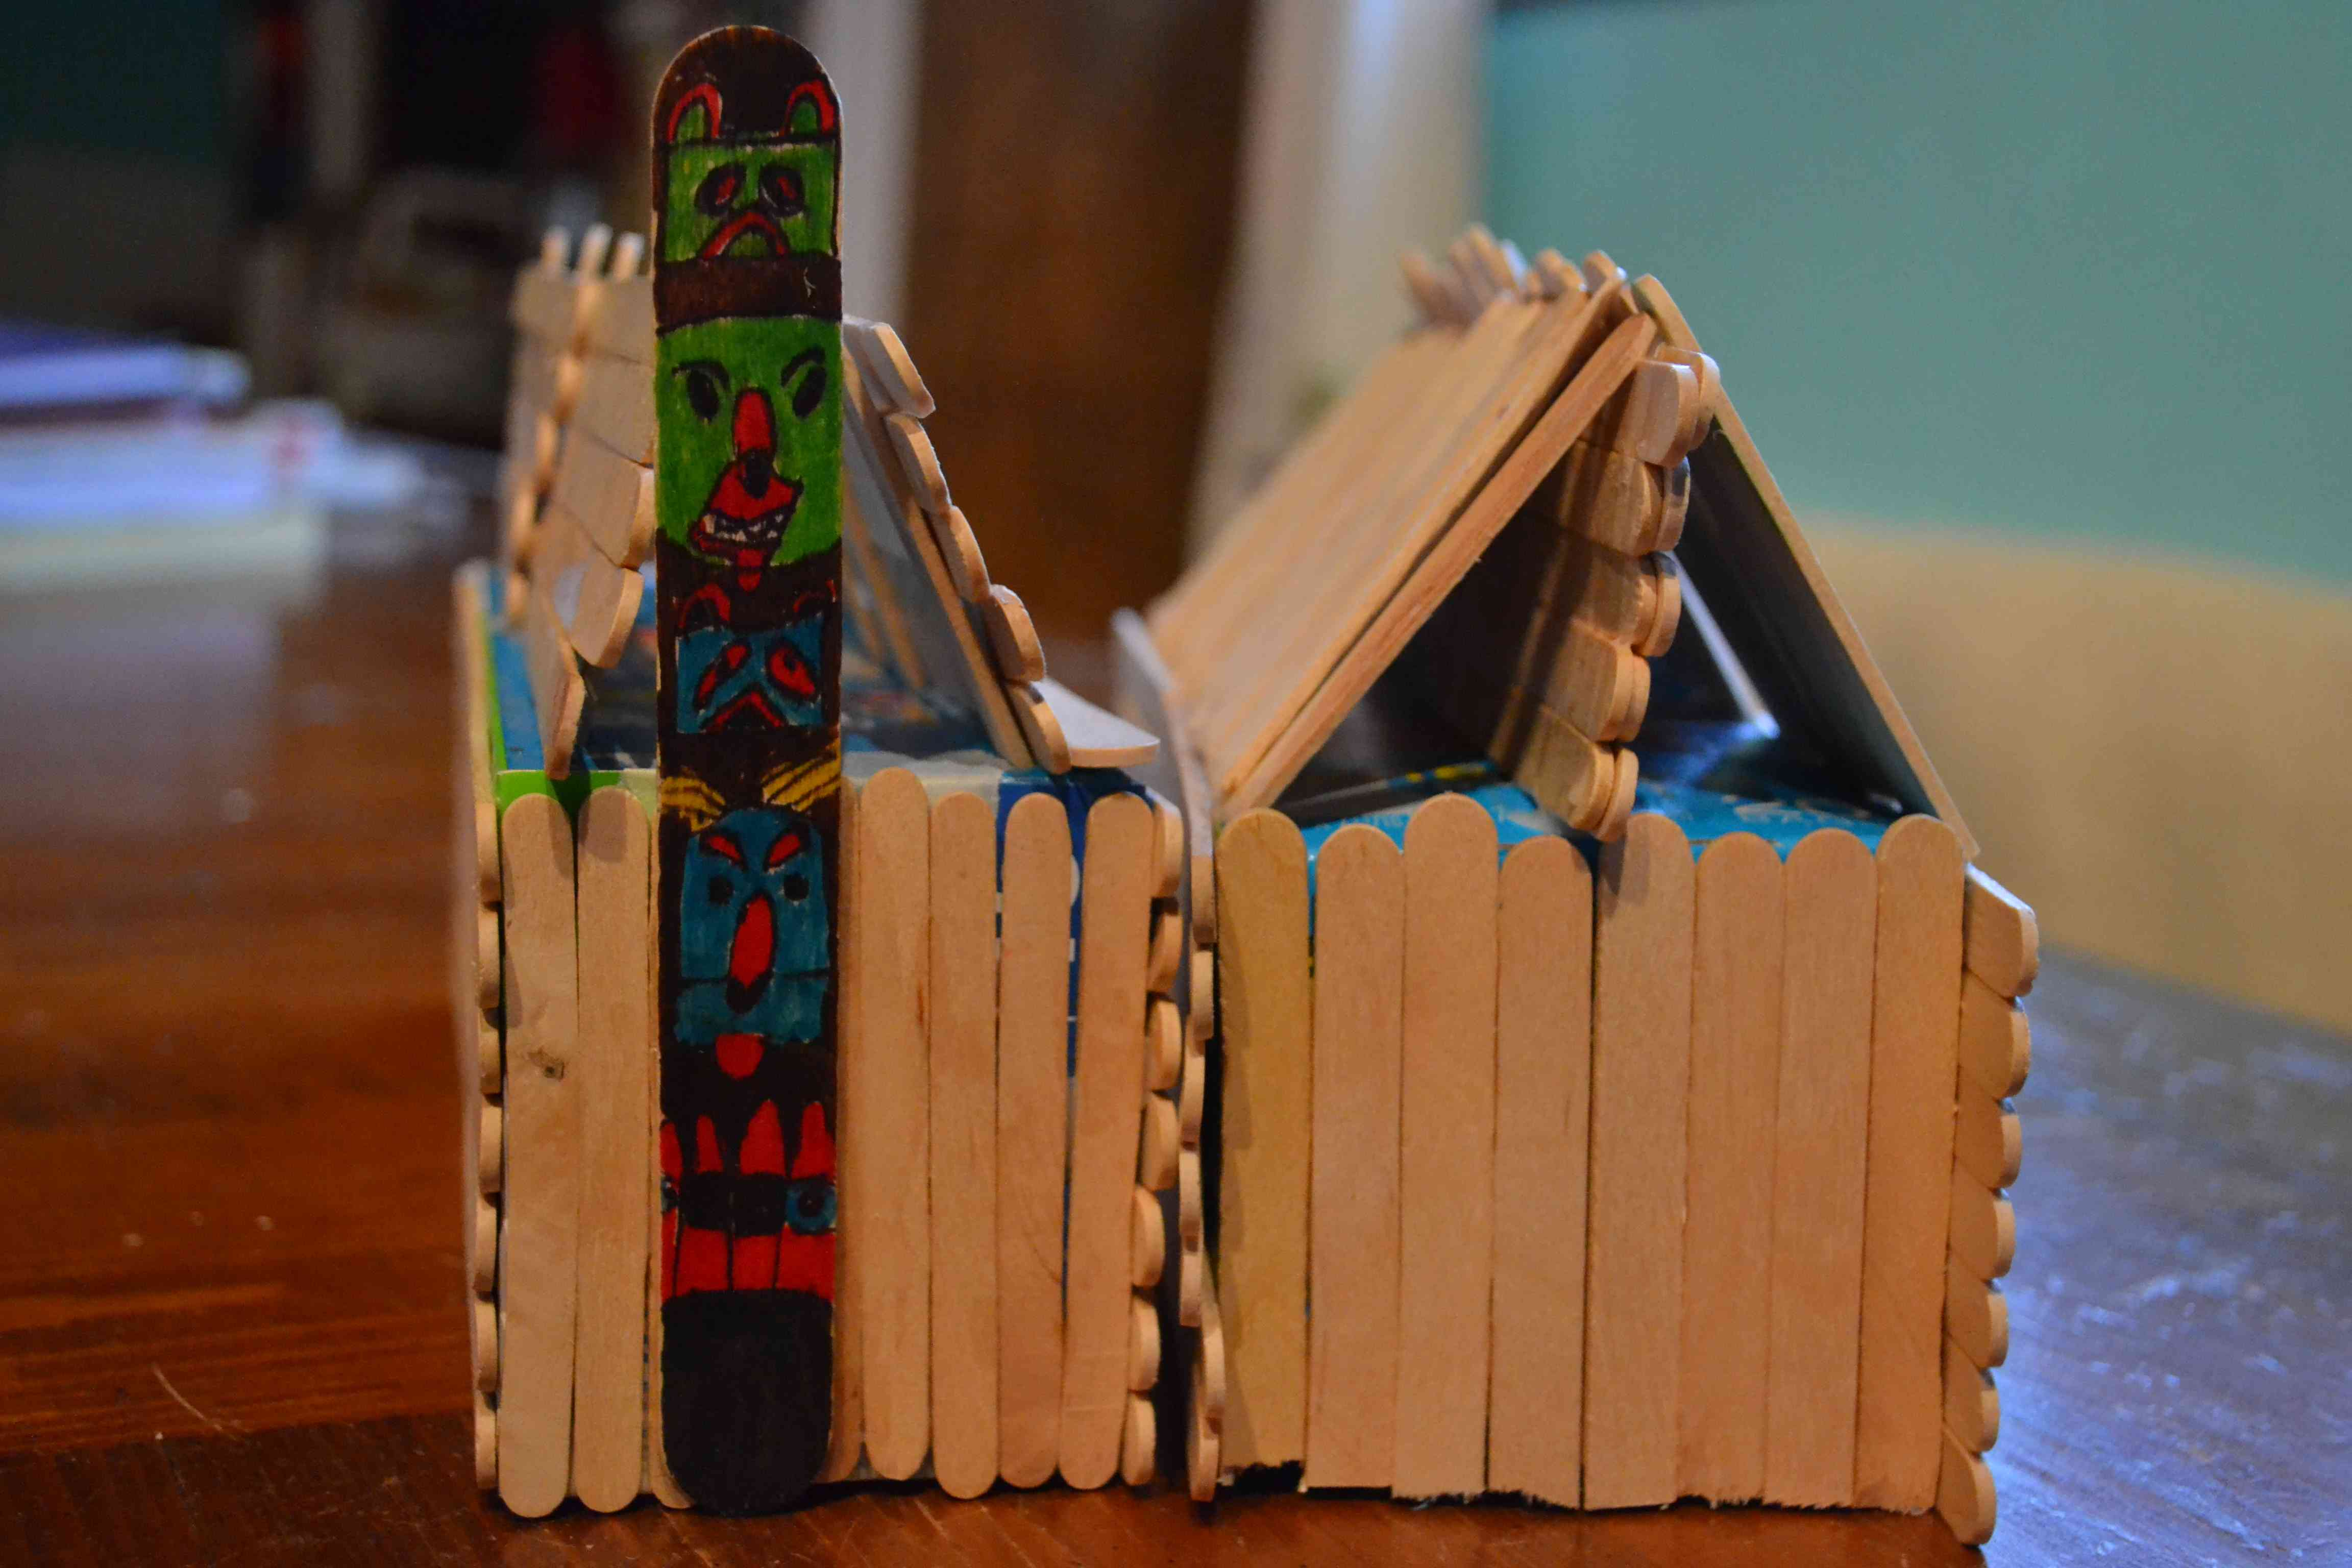 Native Americans Unit Tlingit Nw Coast Part 2